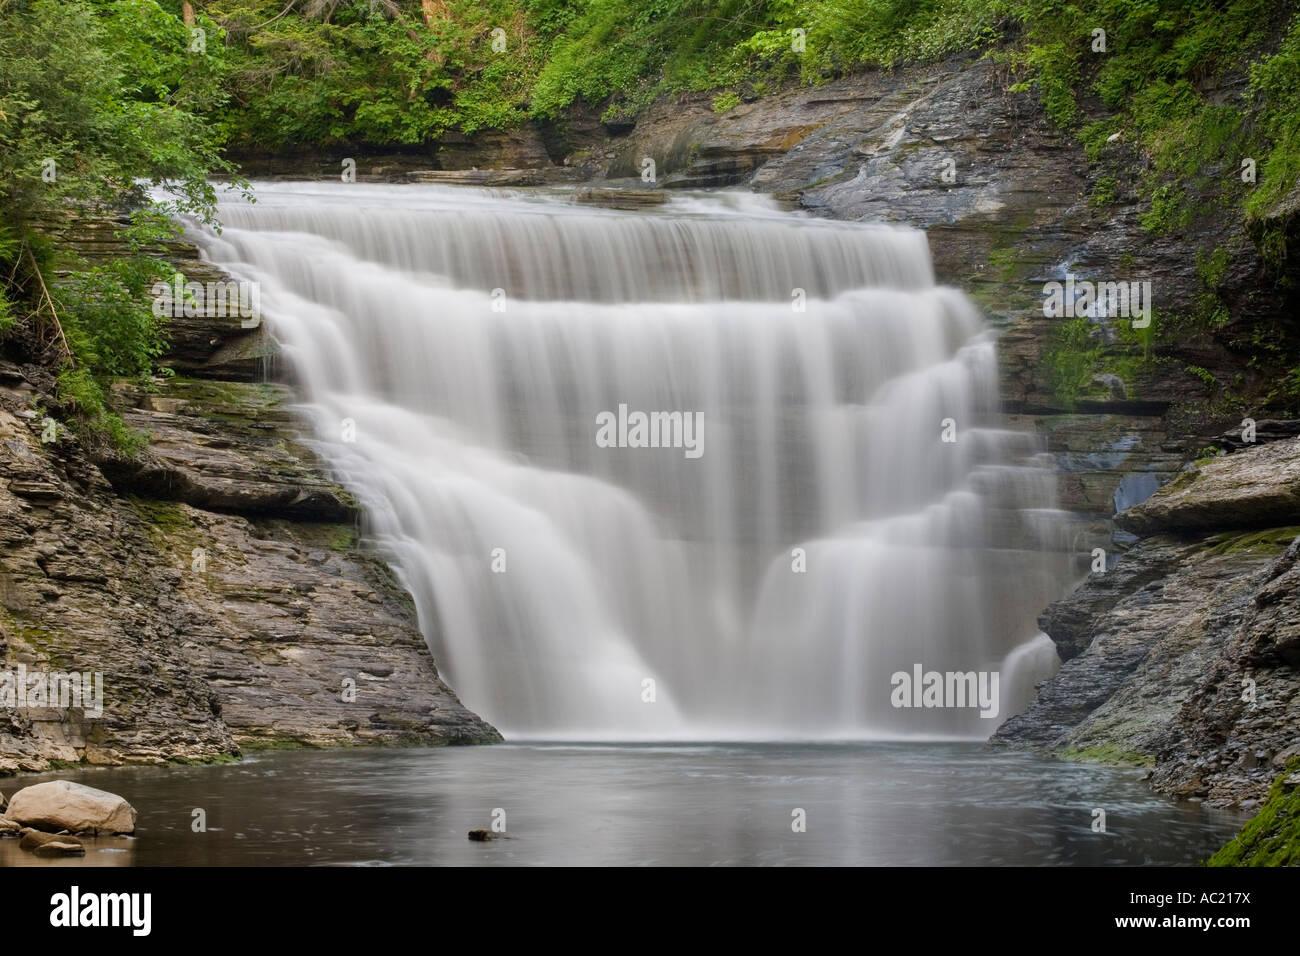 New york montgomery county fonda - Canajoharie Falls Canajoharie New York Montgomery County